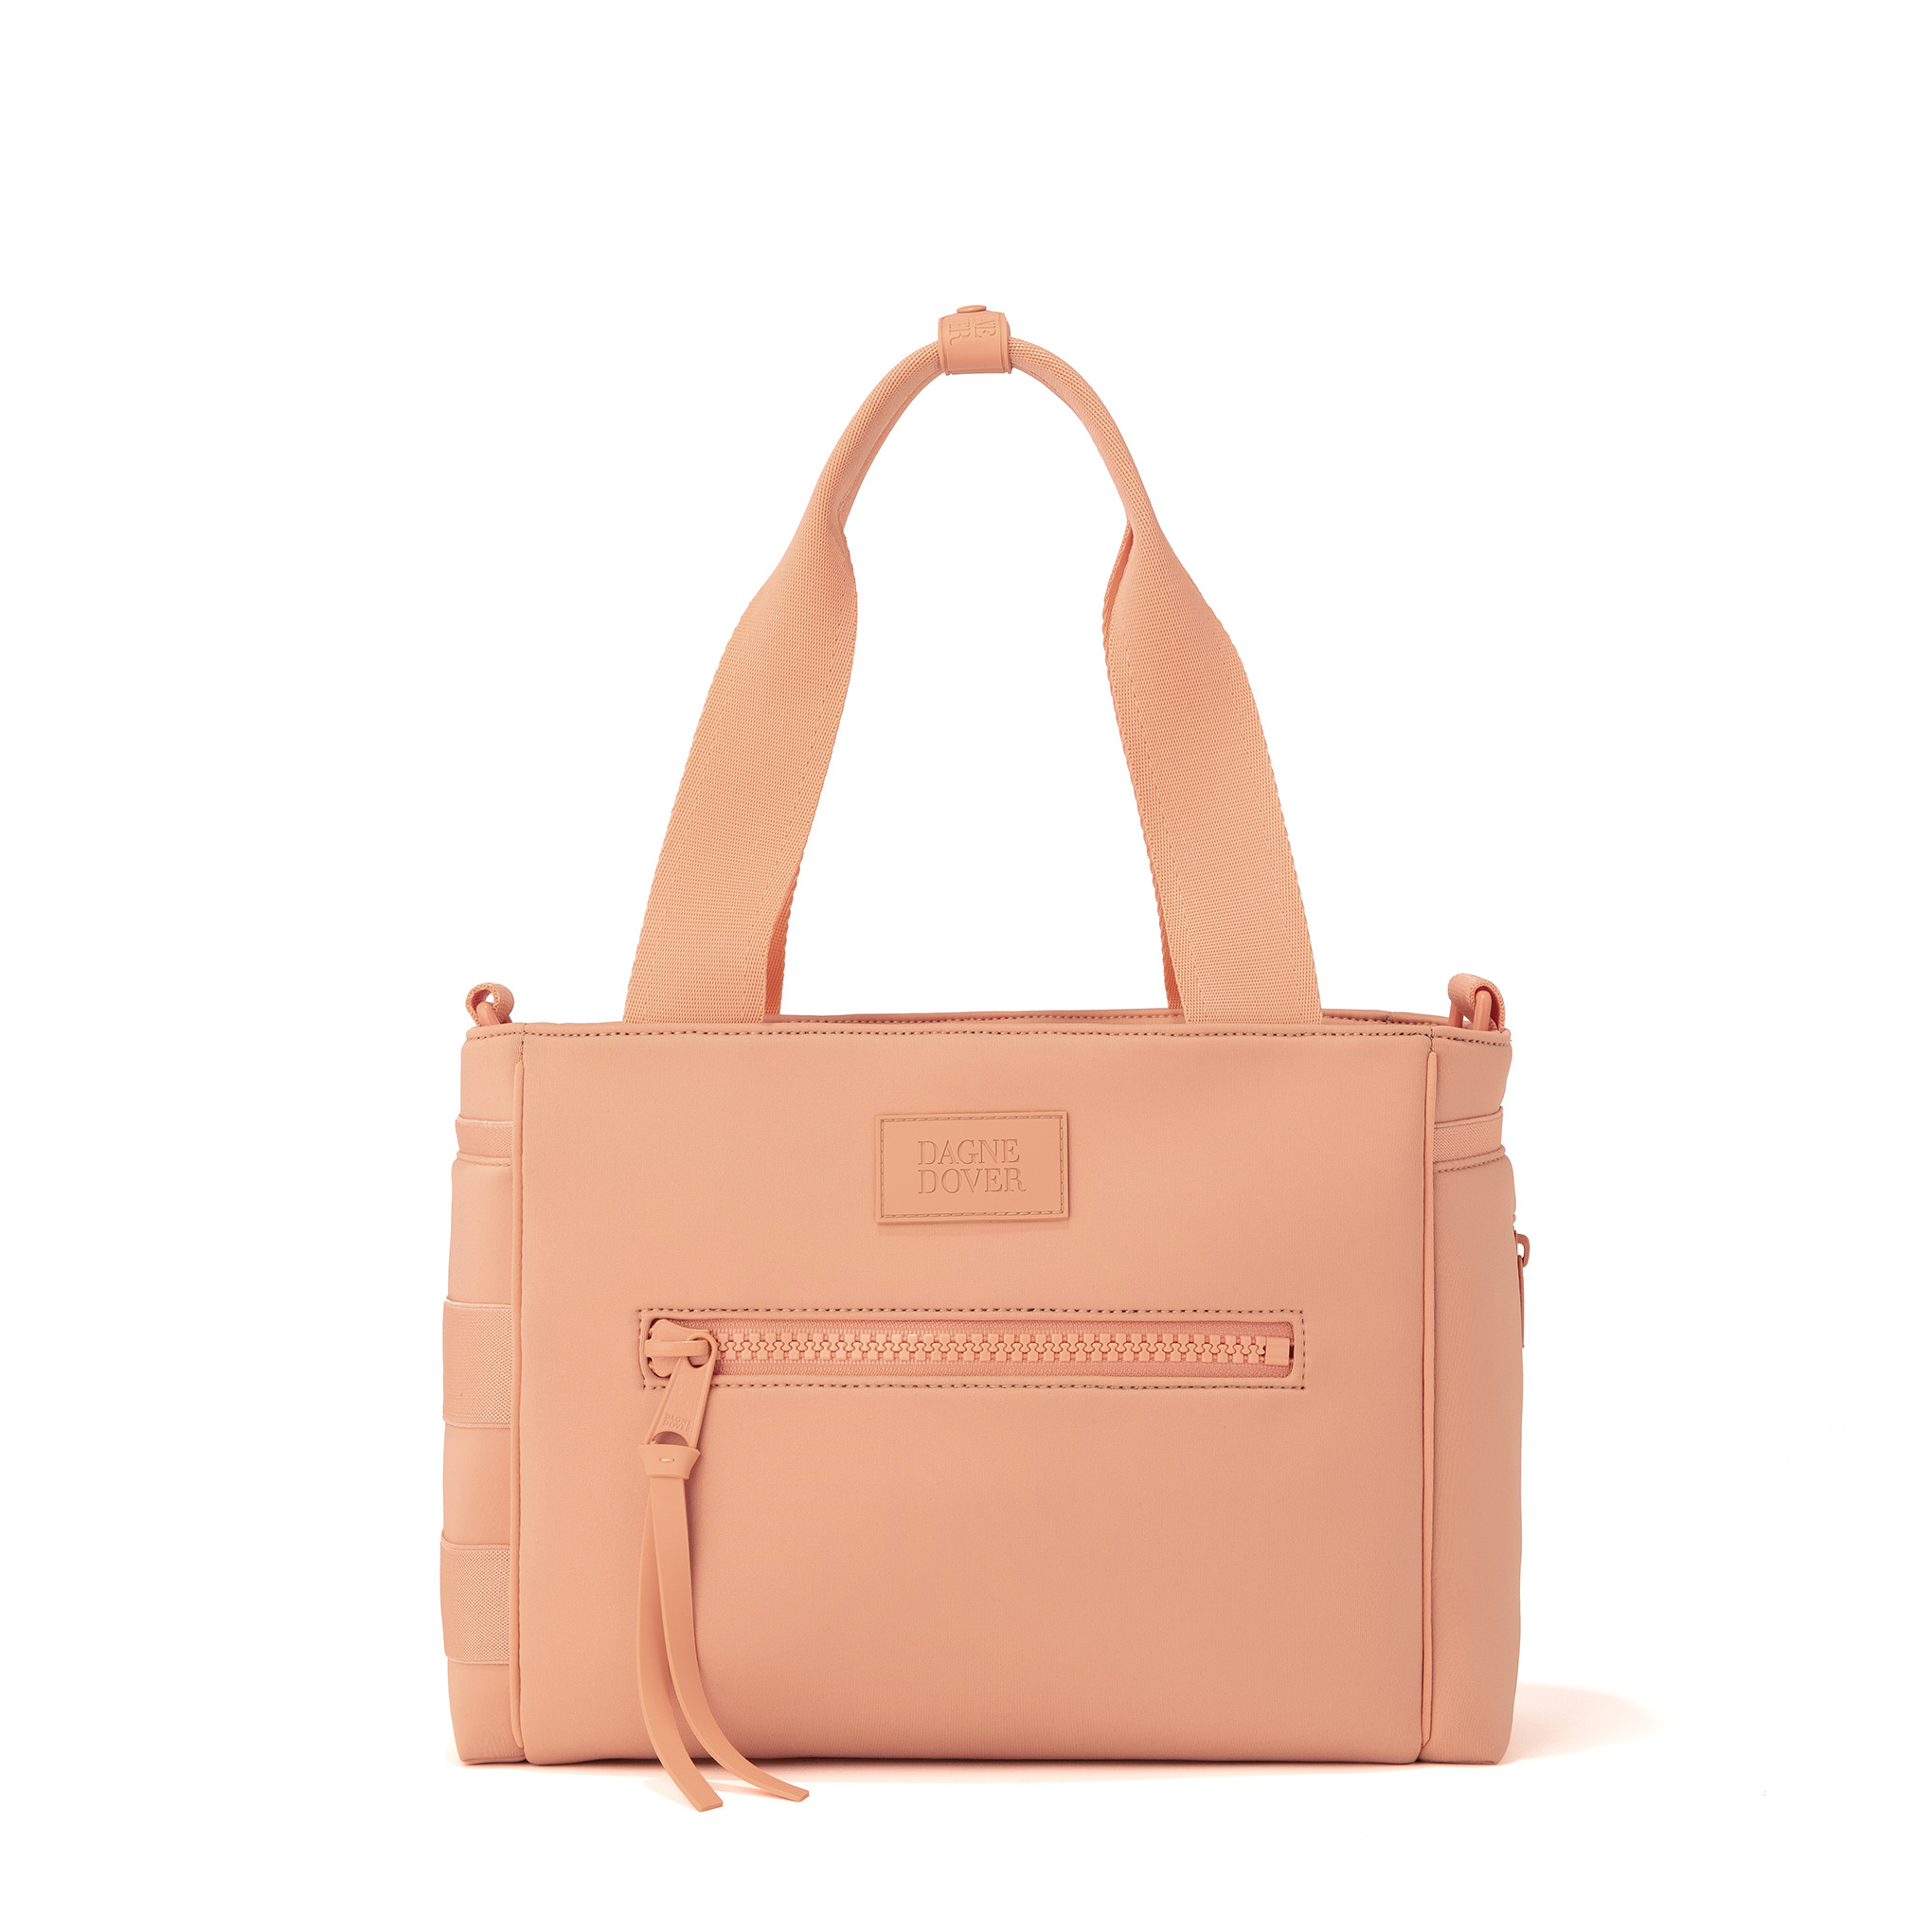 Coral travel purse